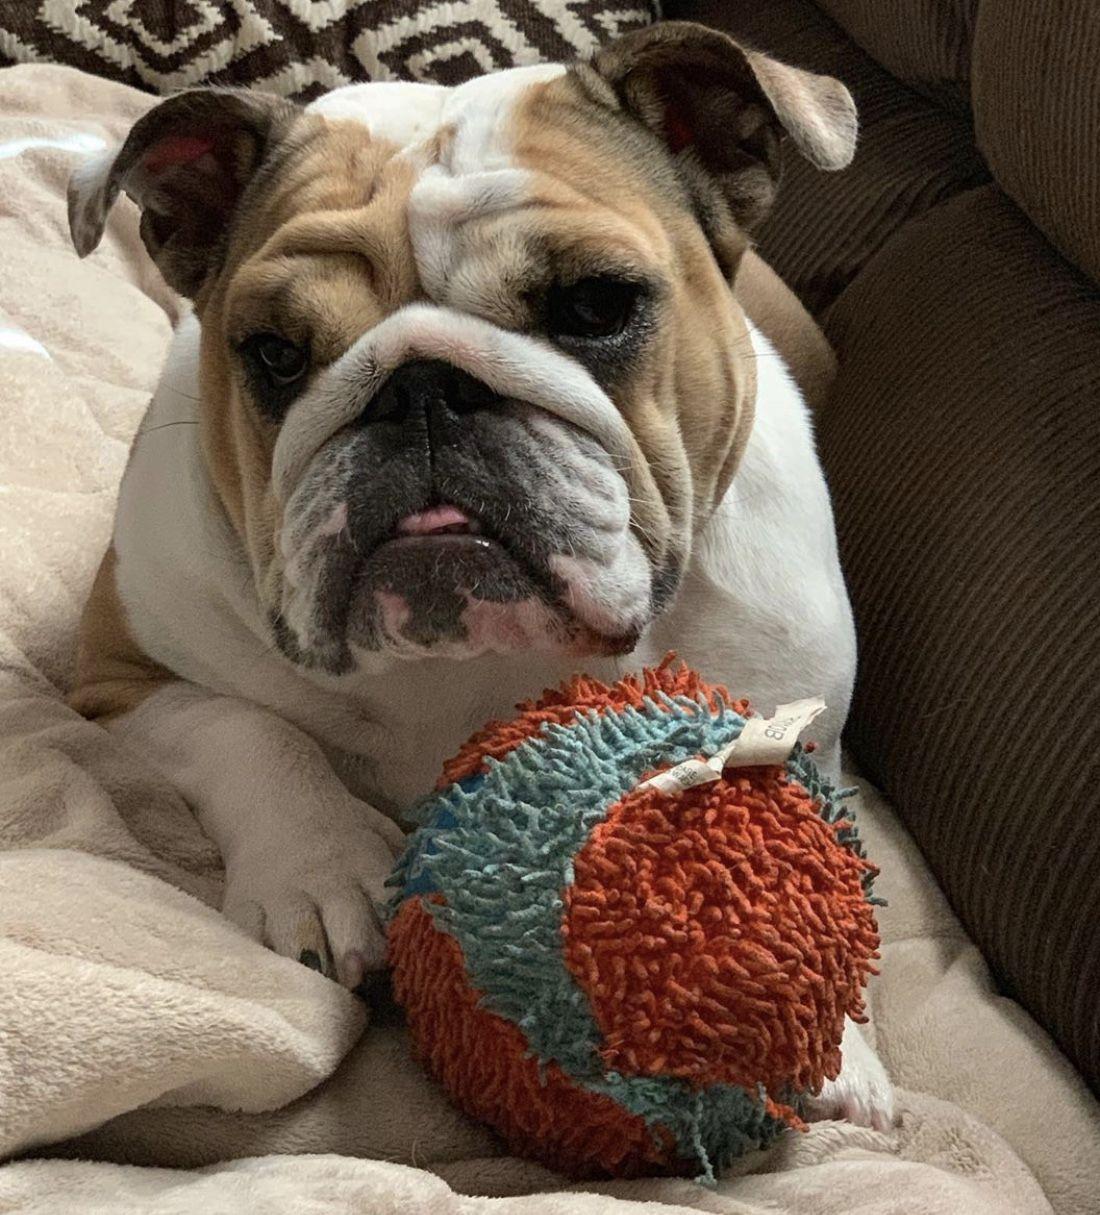 Pin by Traci on bulldogs Bulldog, English bulldog, Hound dog